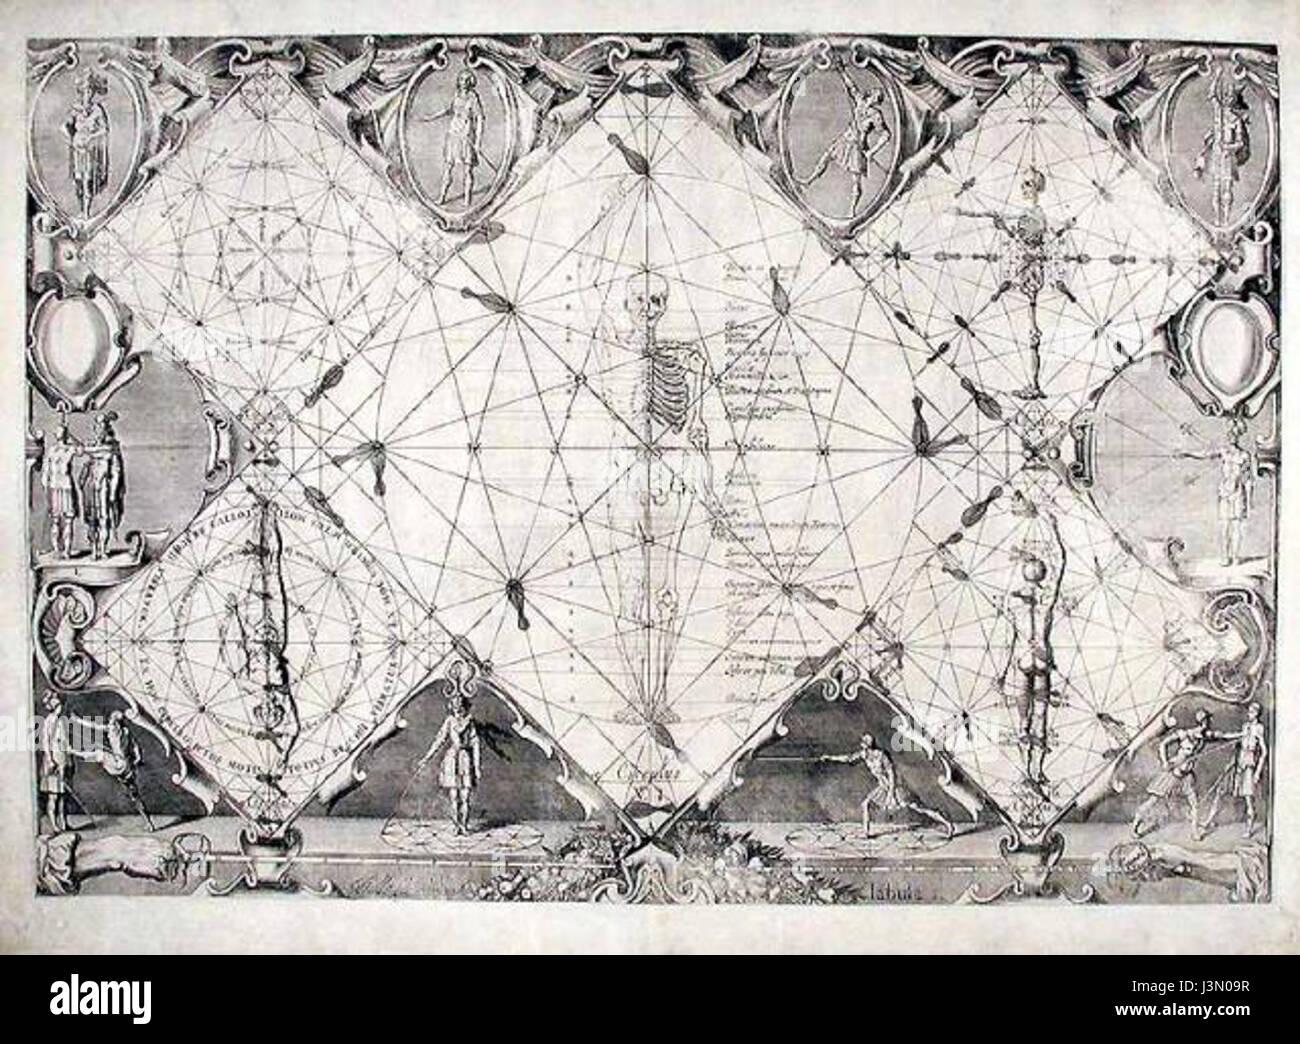 gerard-thibault-mysterious-circle-J3N09R.jpg